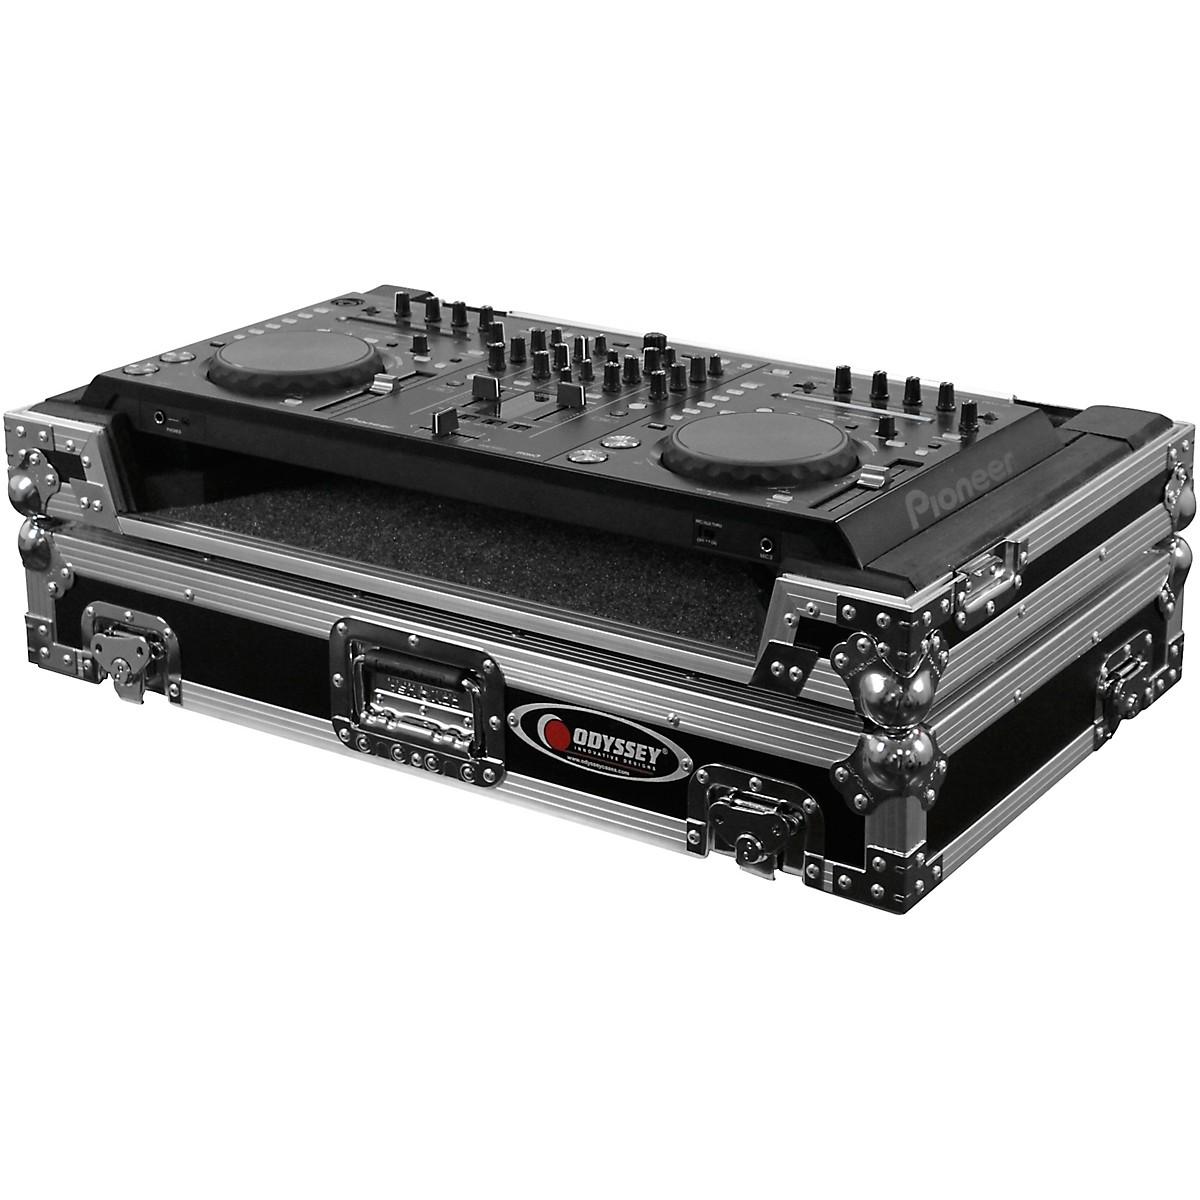 Odyssey FZPIXDJR1BL Pioneer XDJ-R1 DJ Controller Case